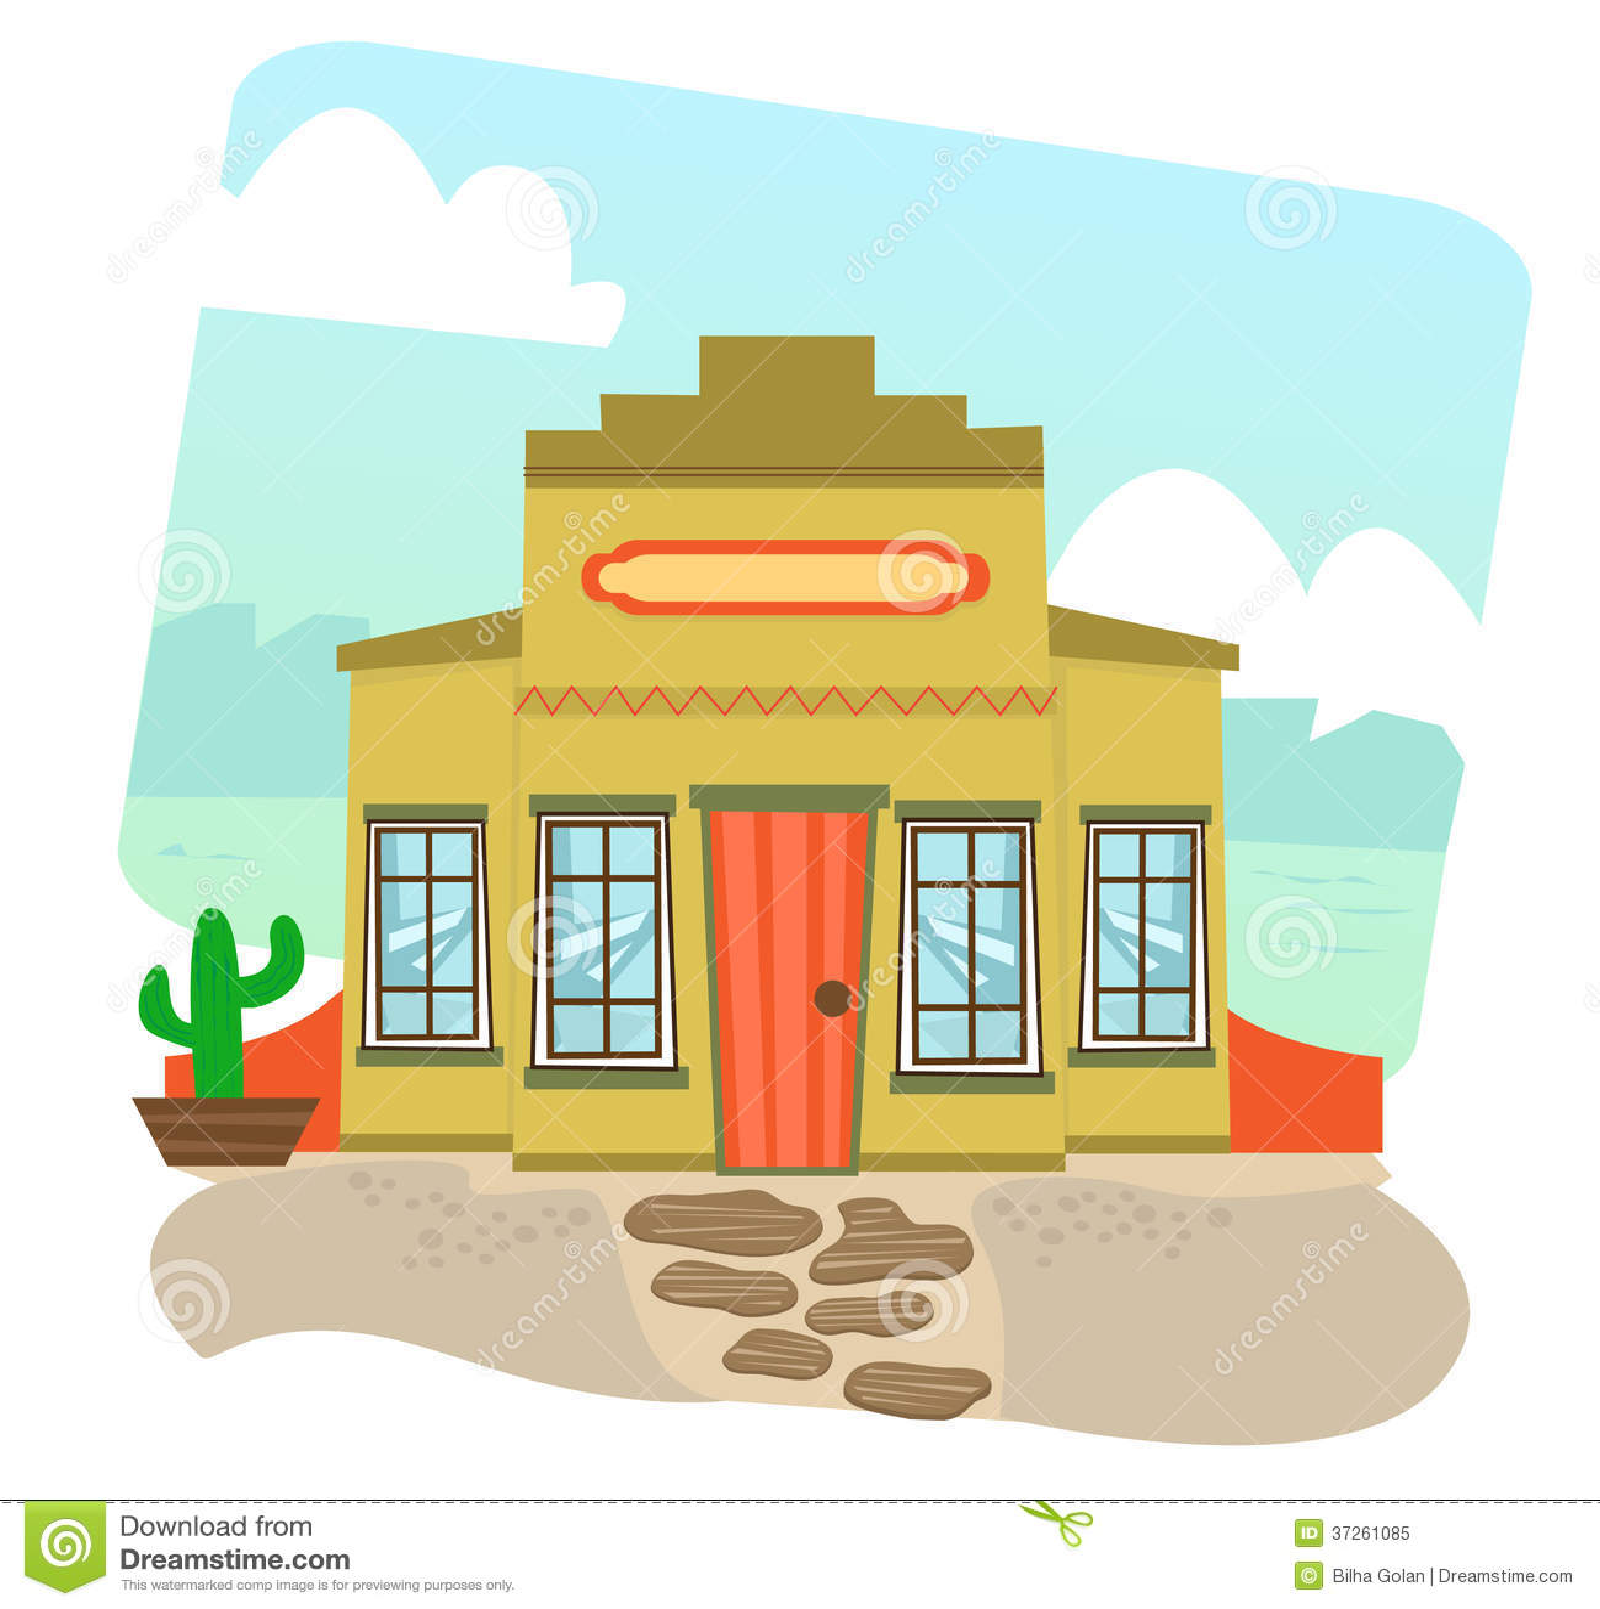 Building cartoon clipart restaurant building and restaurant building - Royalty Free Stock Photo Download Mexican Restaurant